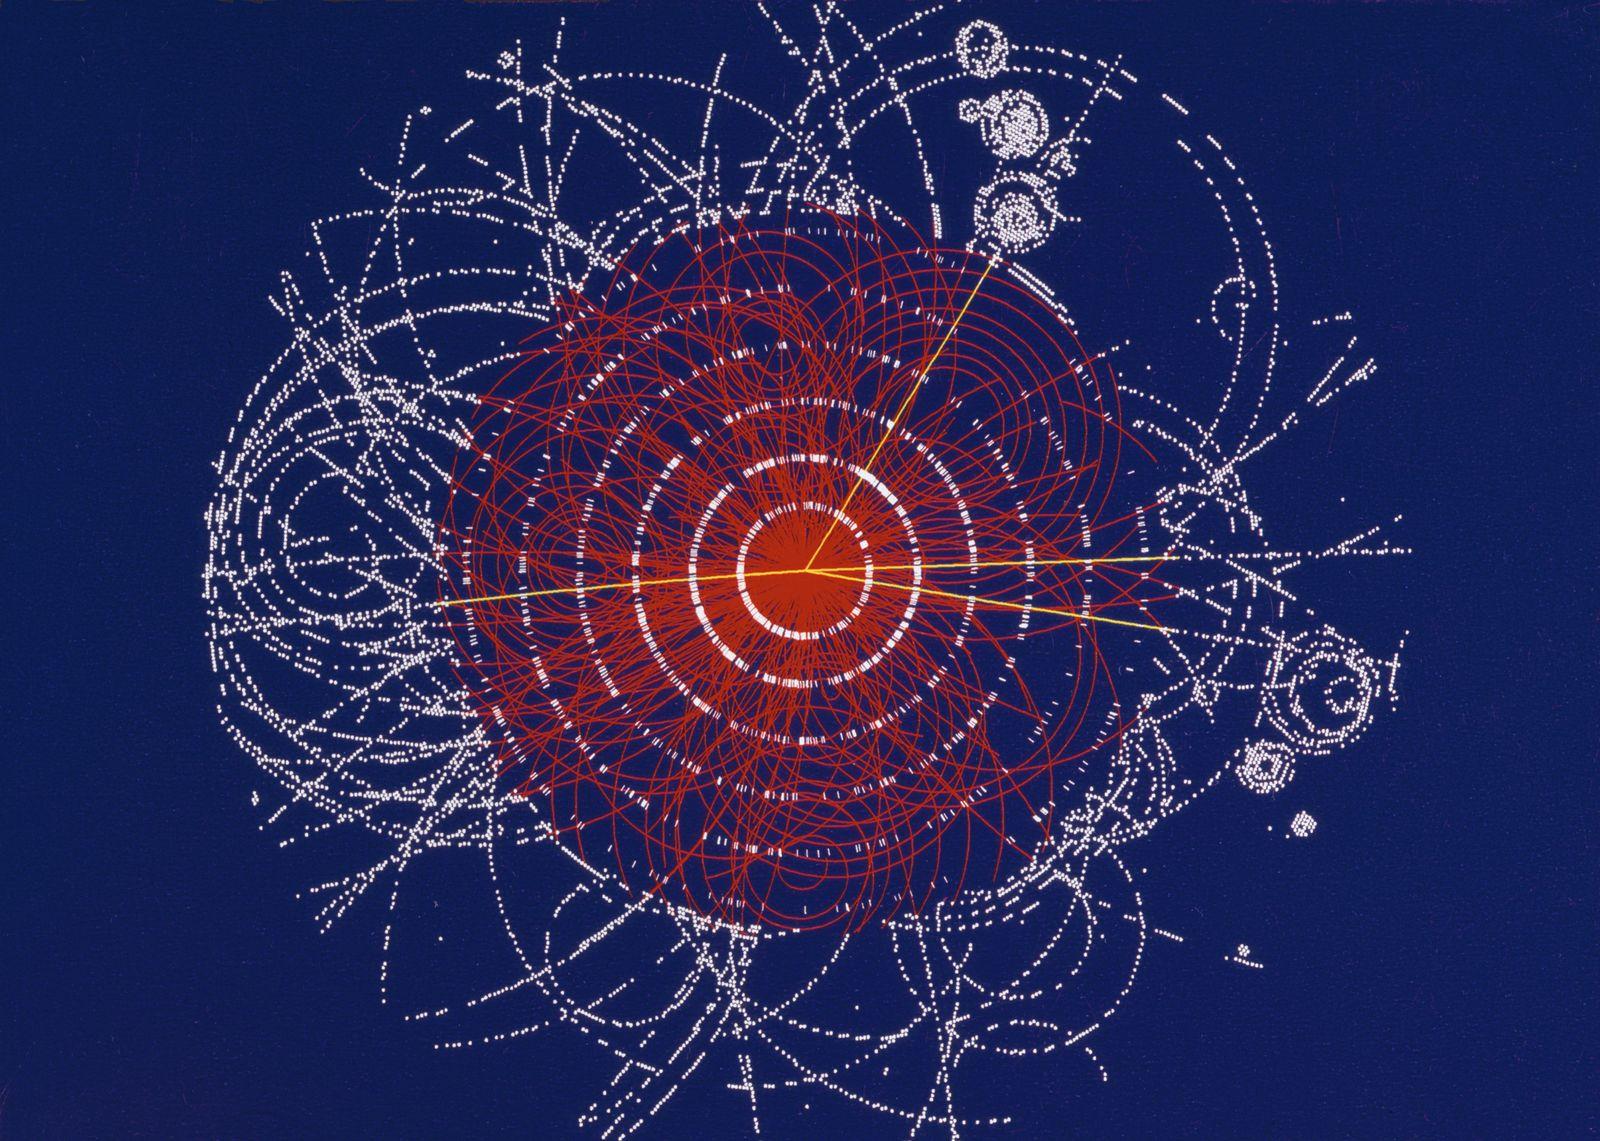 Cern / Higgs Boson / Atlas / WISSENSCHAFT